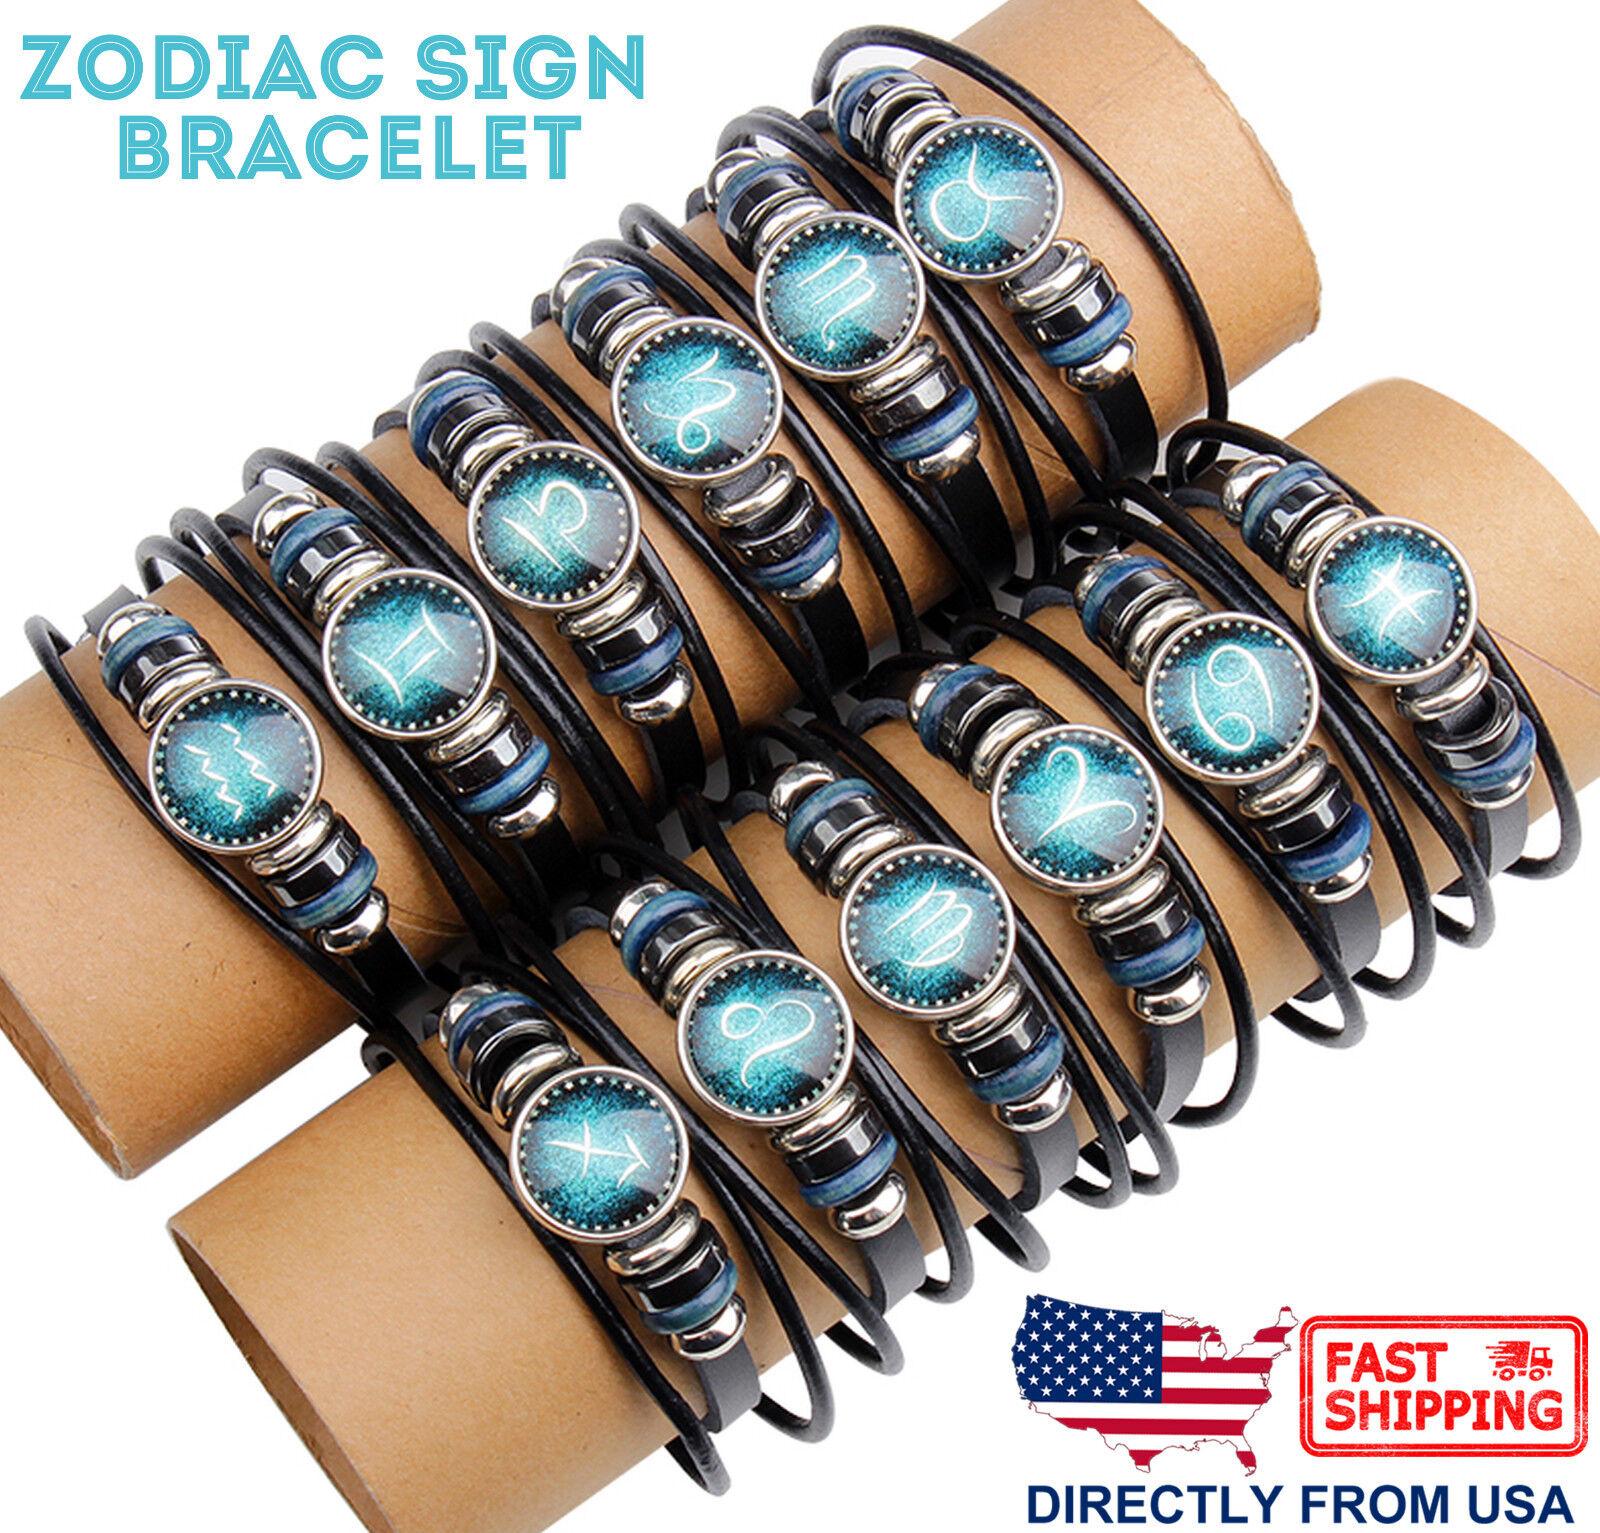 Unisex Astrology Constellation Zodiac Sign Horoscope Leather Wristband Bracelet Bracelets